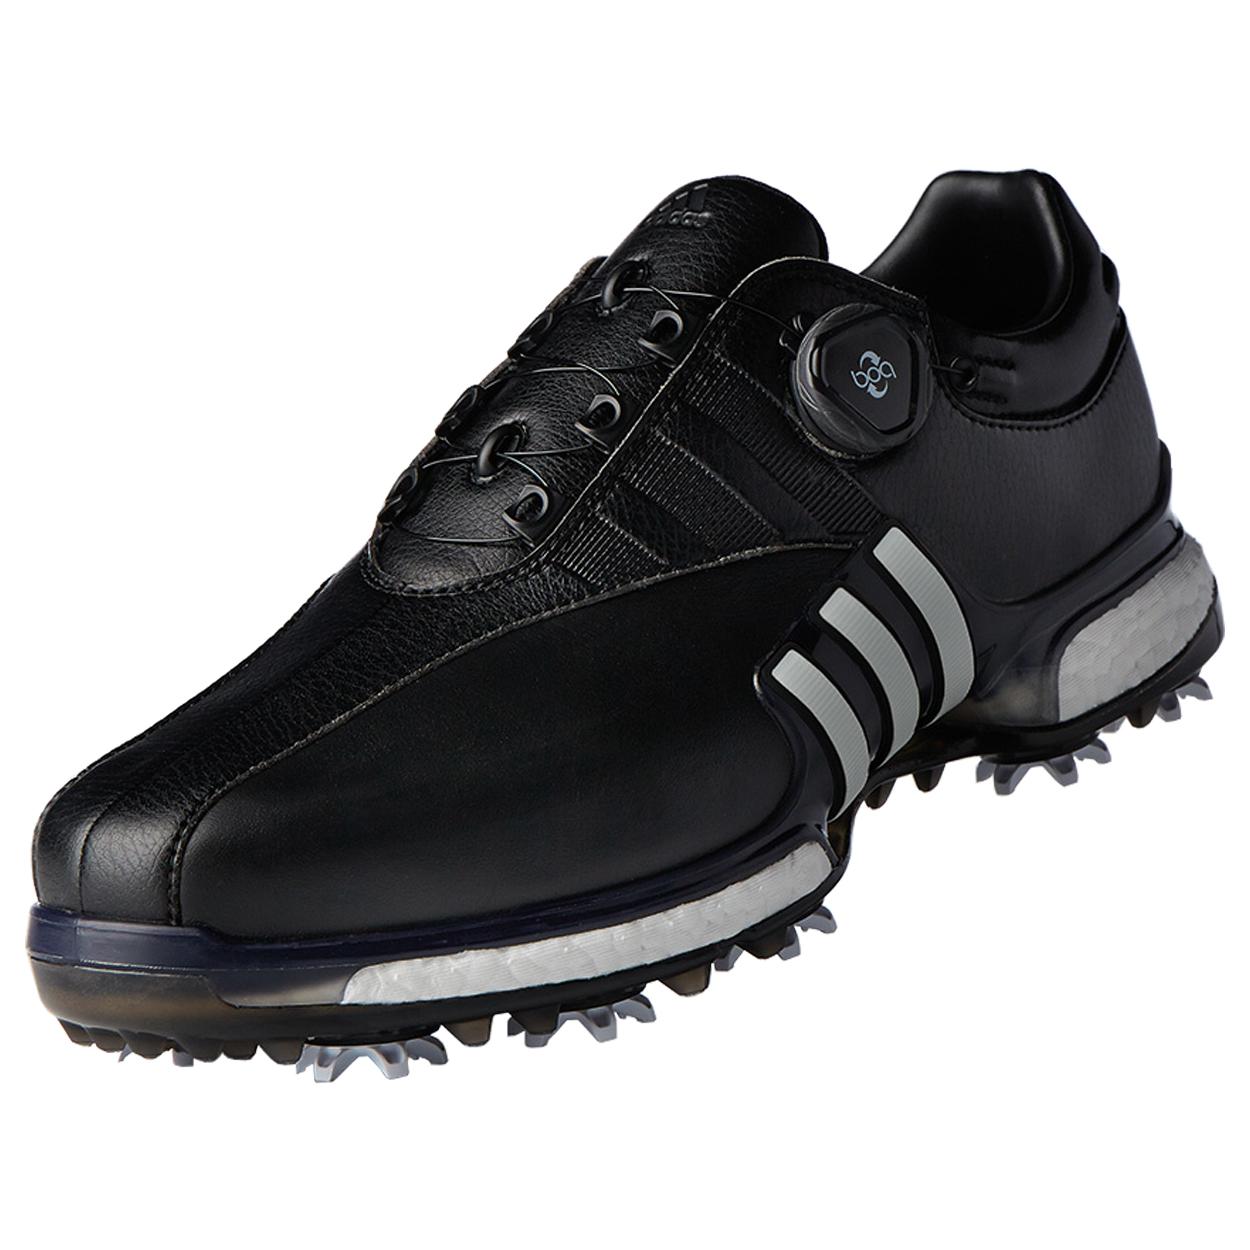 Adidas Men's Tour 360 EQT Boa Golf Shoe